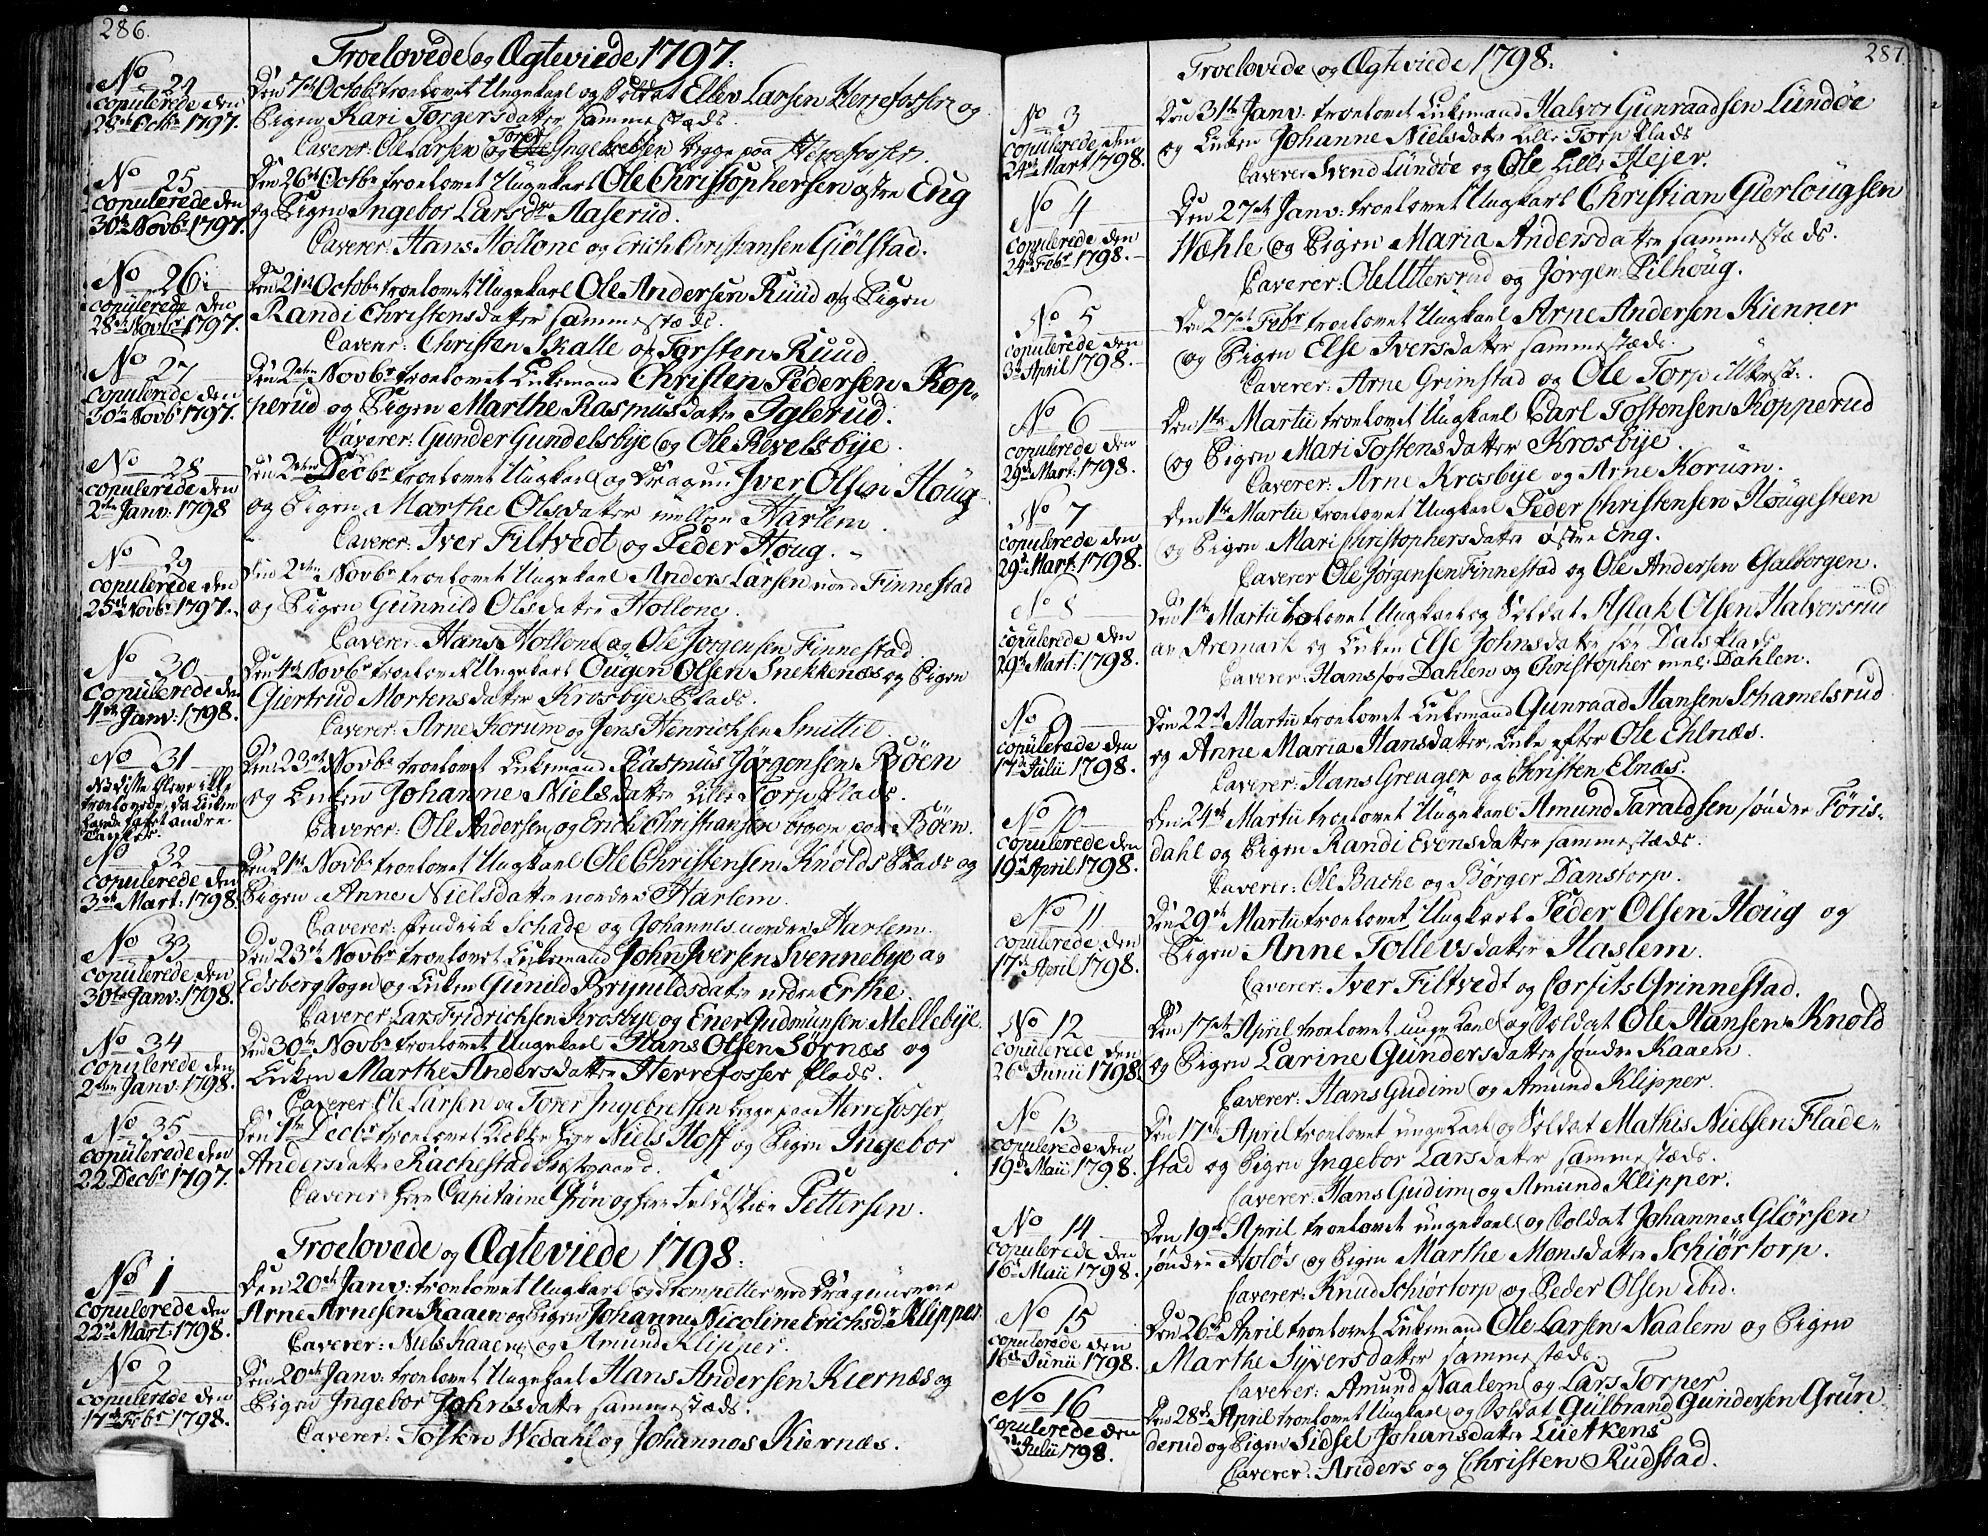 SAO, Rakkestad prestekontor Kirkebøker, F/Fa/L0005: Ministerialbok nr. I 5, 1784-1814, s. 286-287